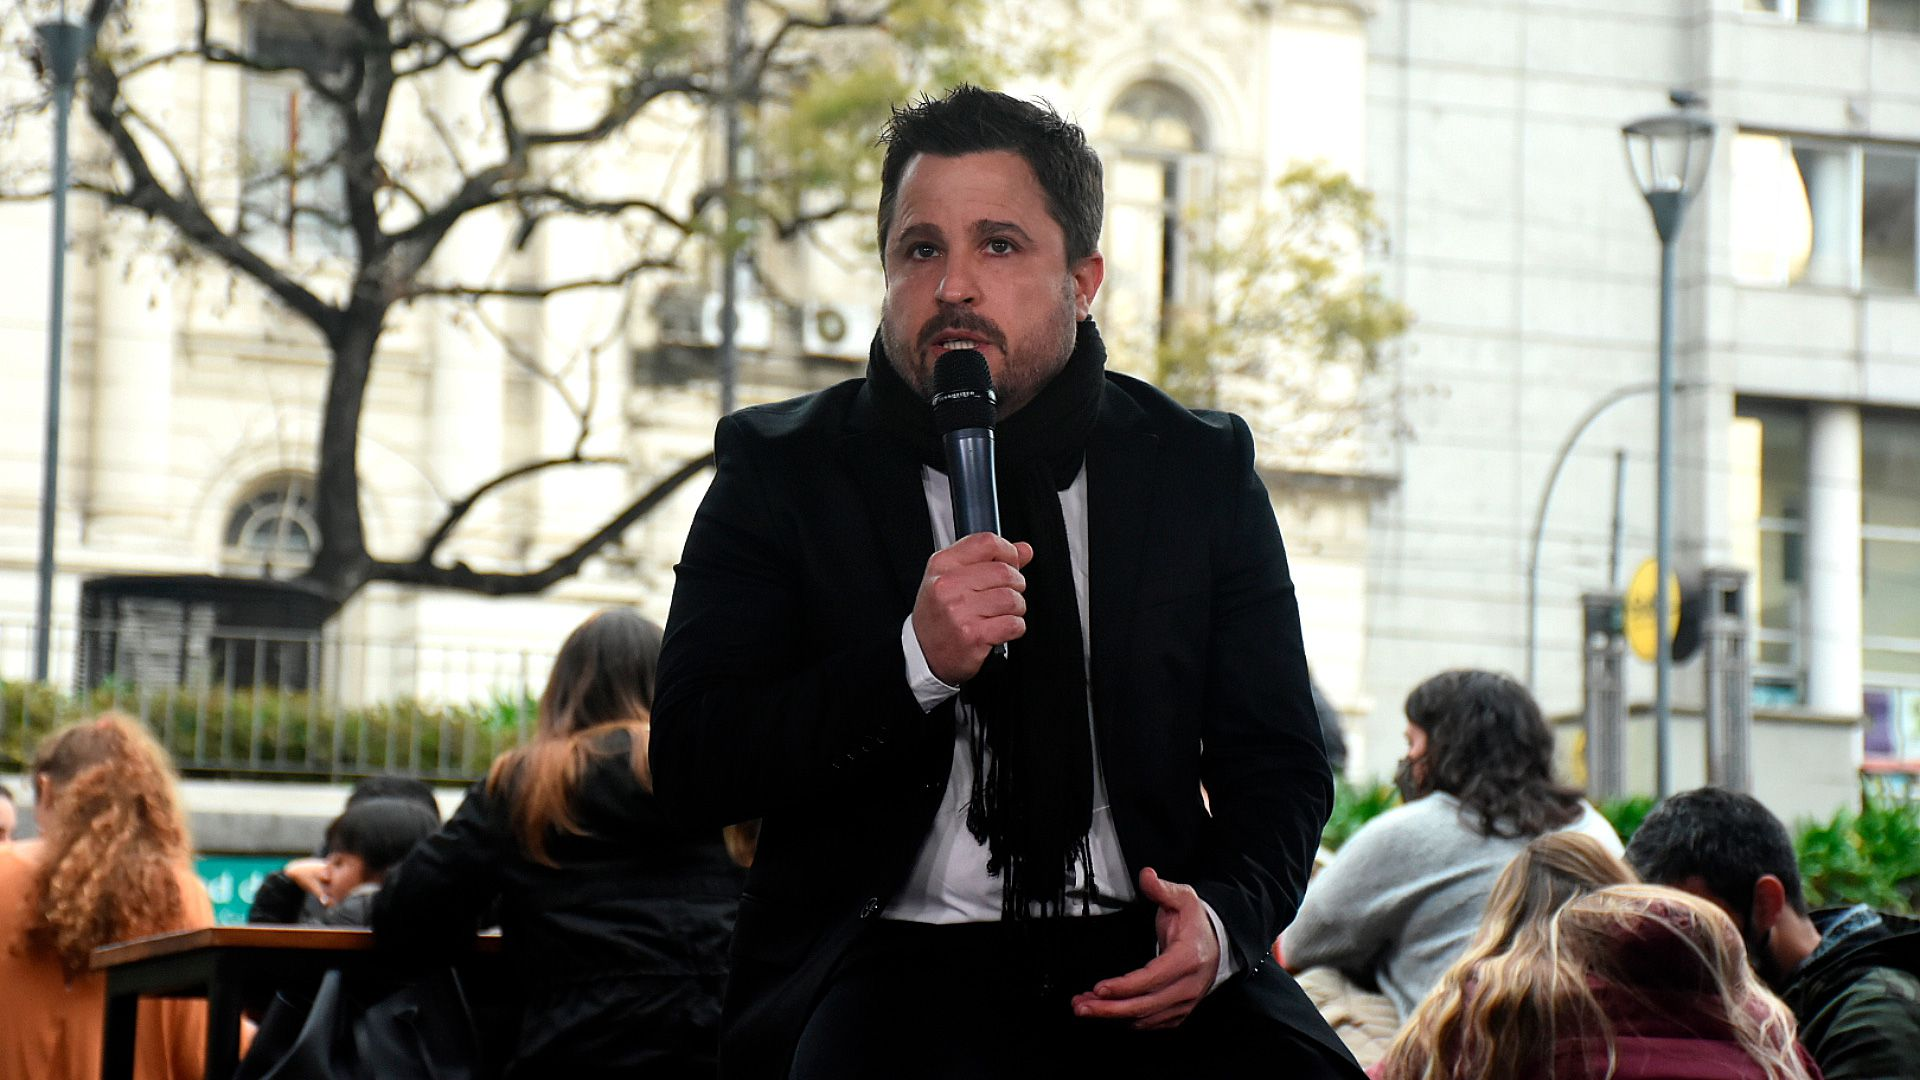 Presentacion MARTIN TETAZ candidato diputado uce martin lousteau